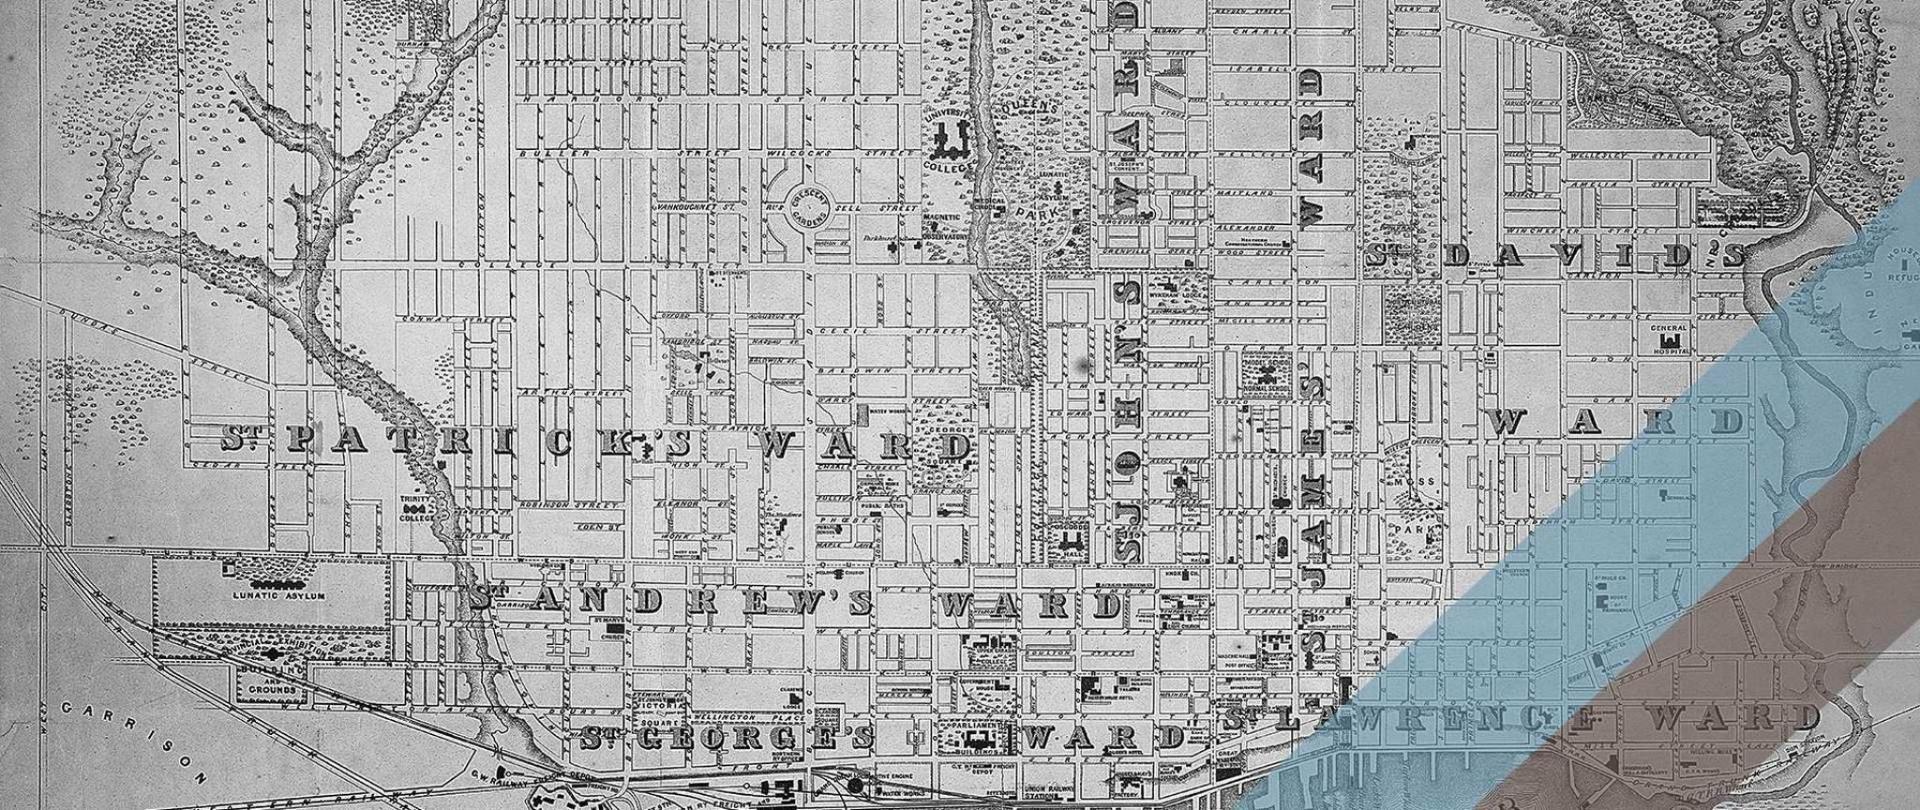 st-james-ward-map-rev1-1.jpg.1920x810_default.jpeg